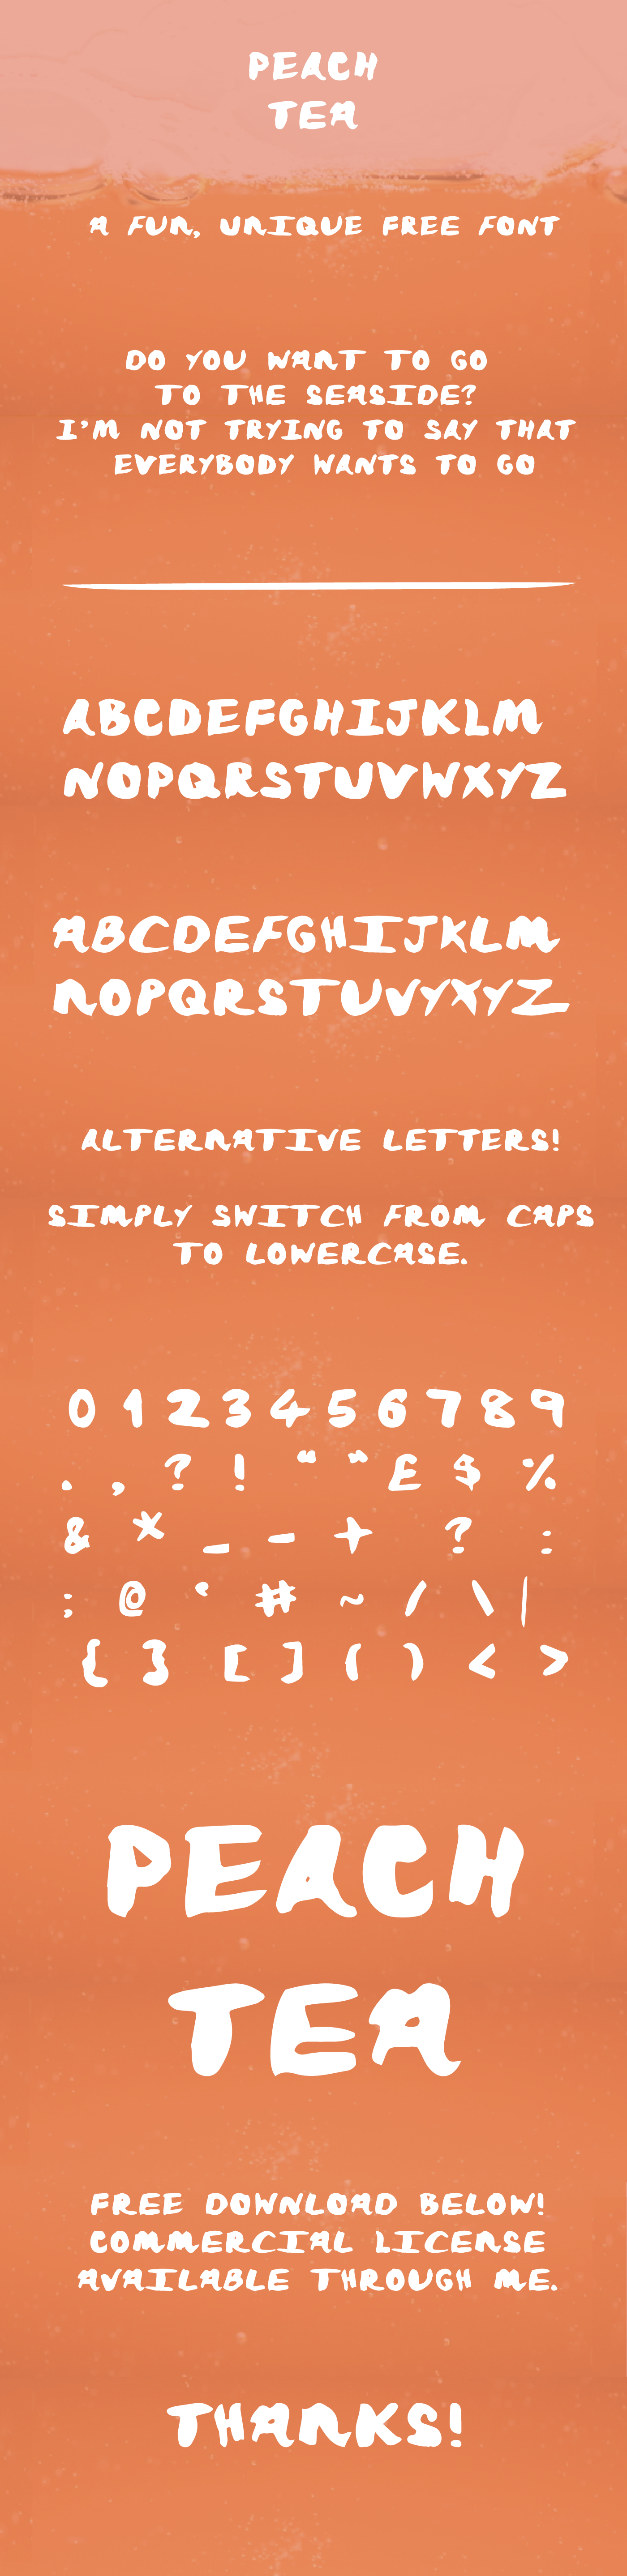 font free Free font Typeface free typeface peach tea font Peach Tea amy cox new Fun logos logo peach tea Amy